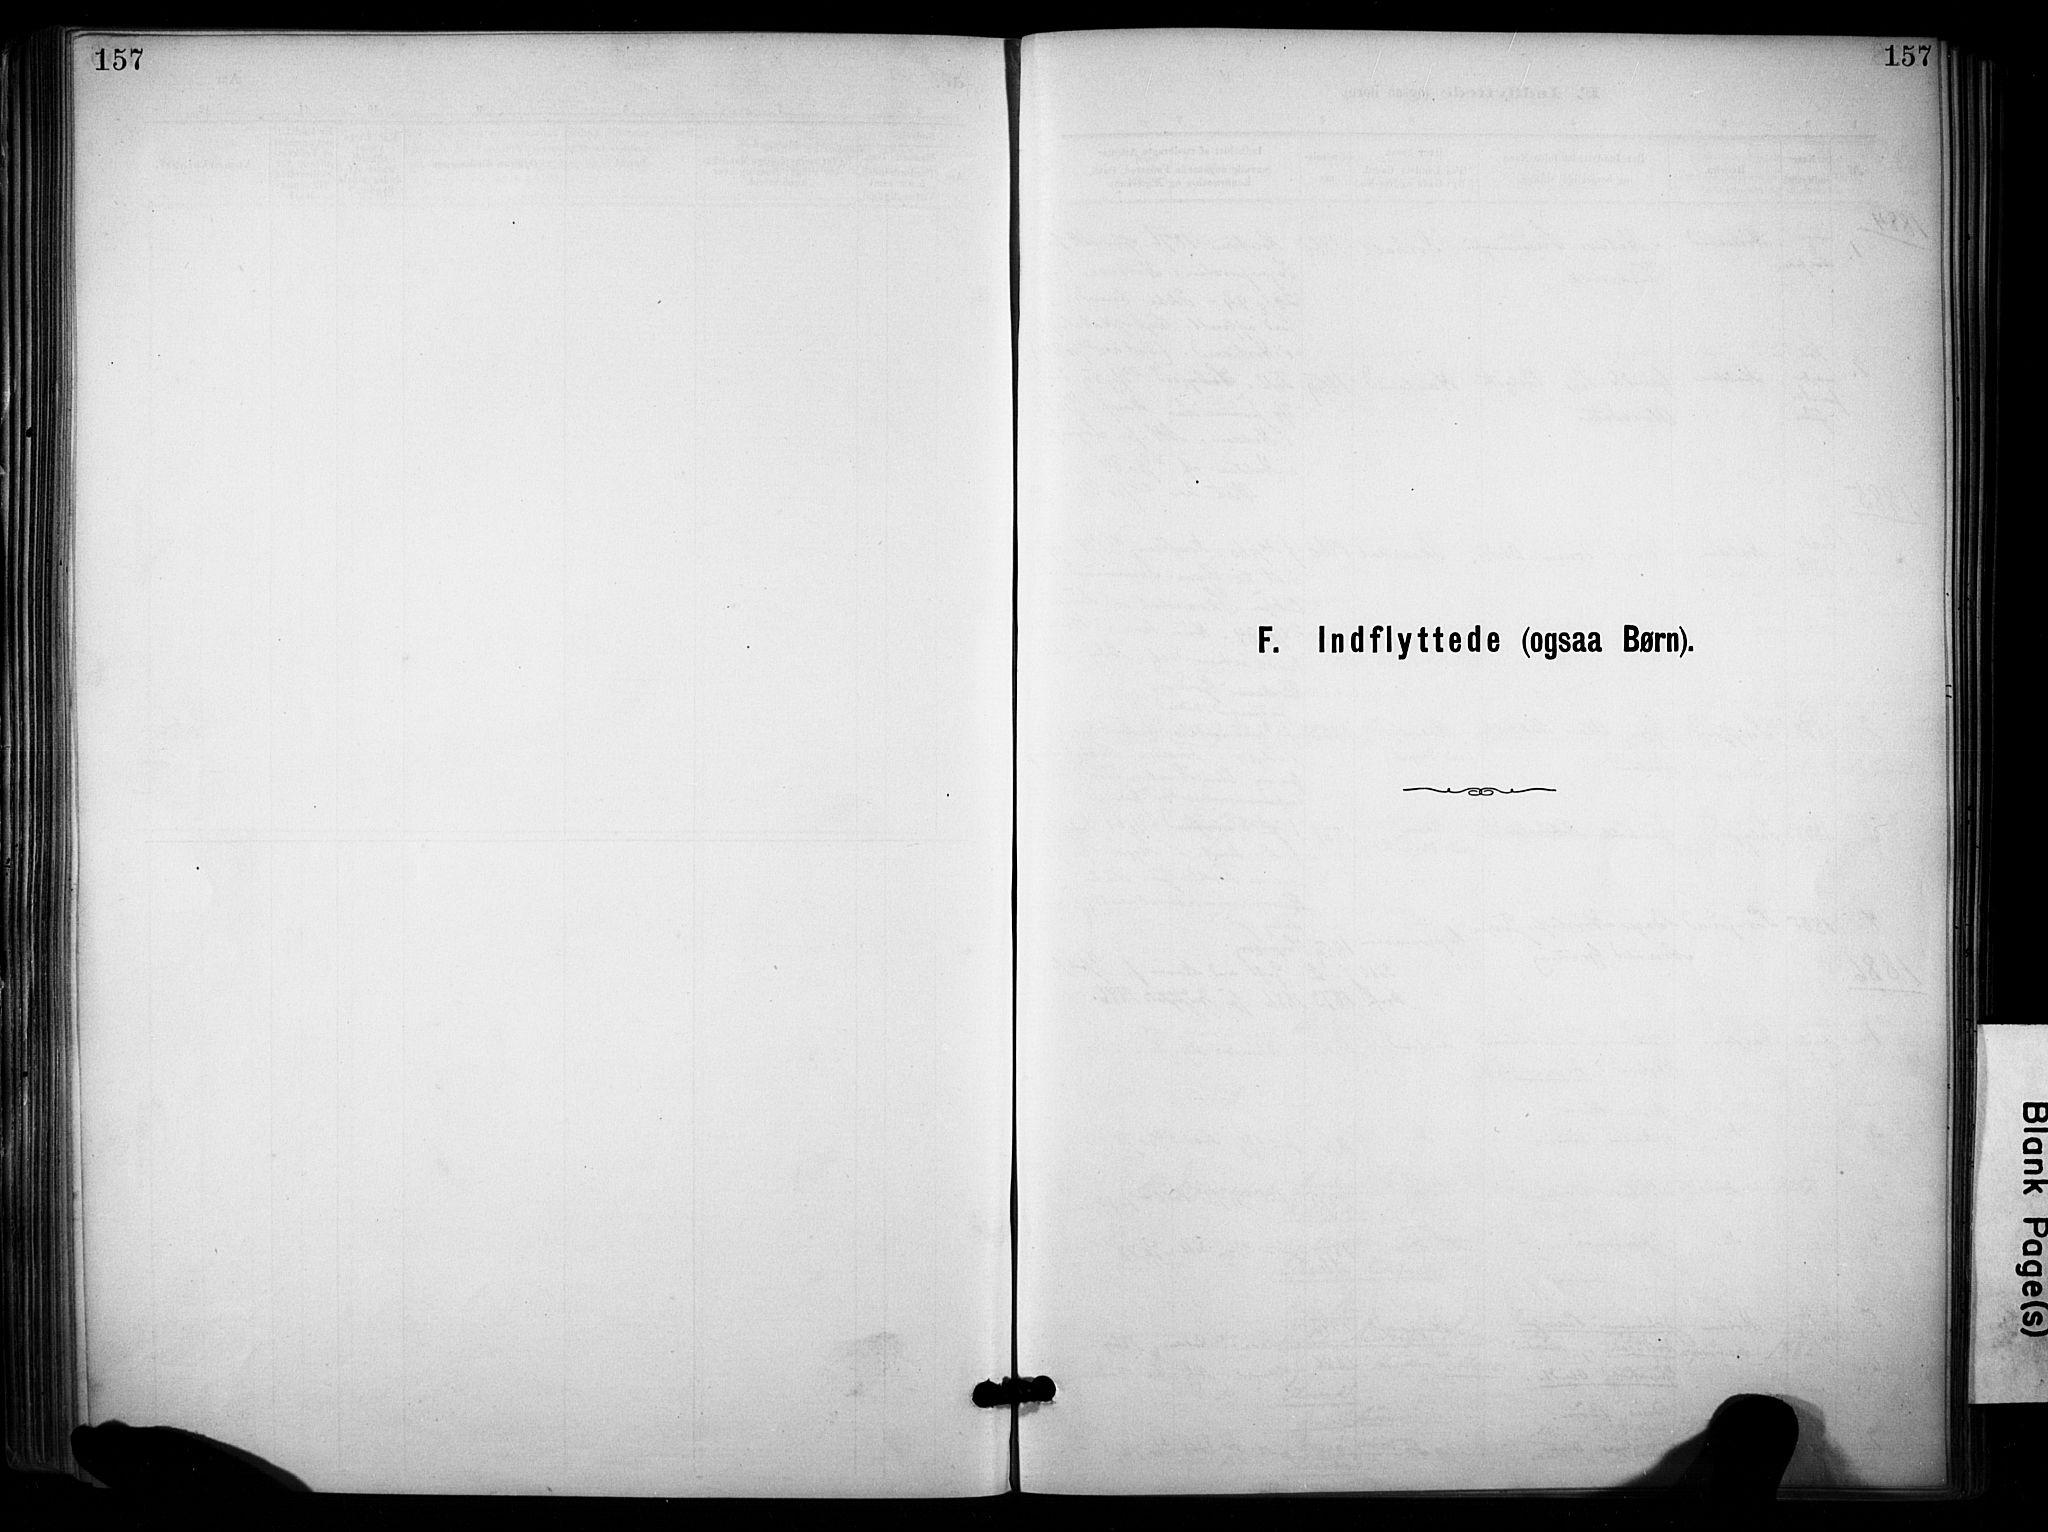 SAKO, Lunde kirkebøker, F/Fa/L0002: Ministerialbok nr. I 2, 1884-1892, s. 157